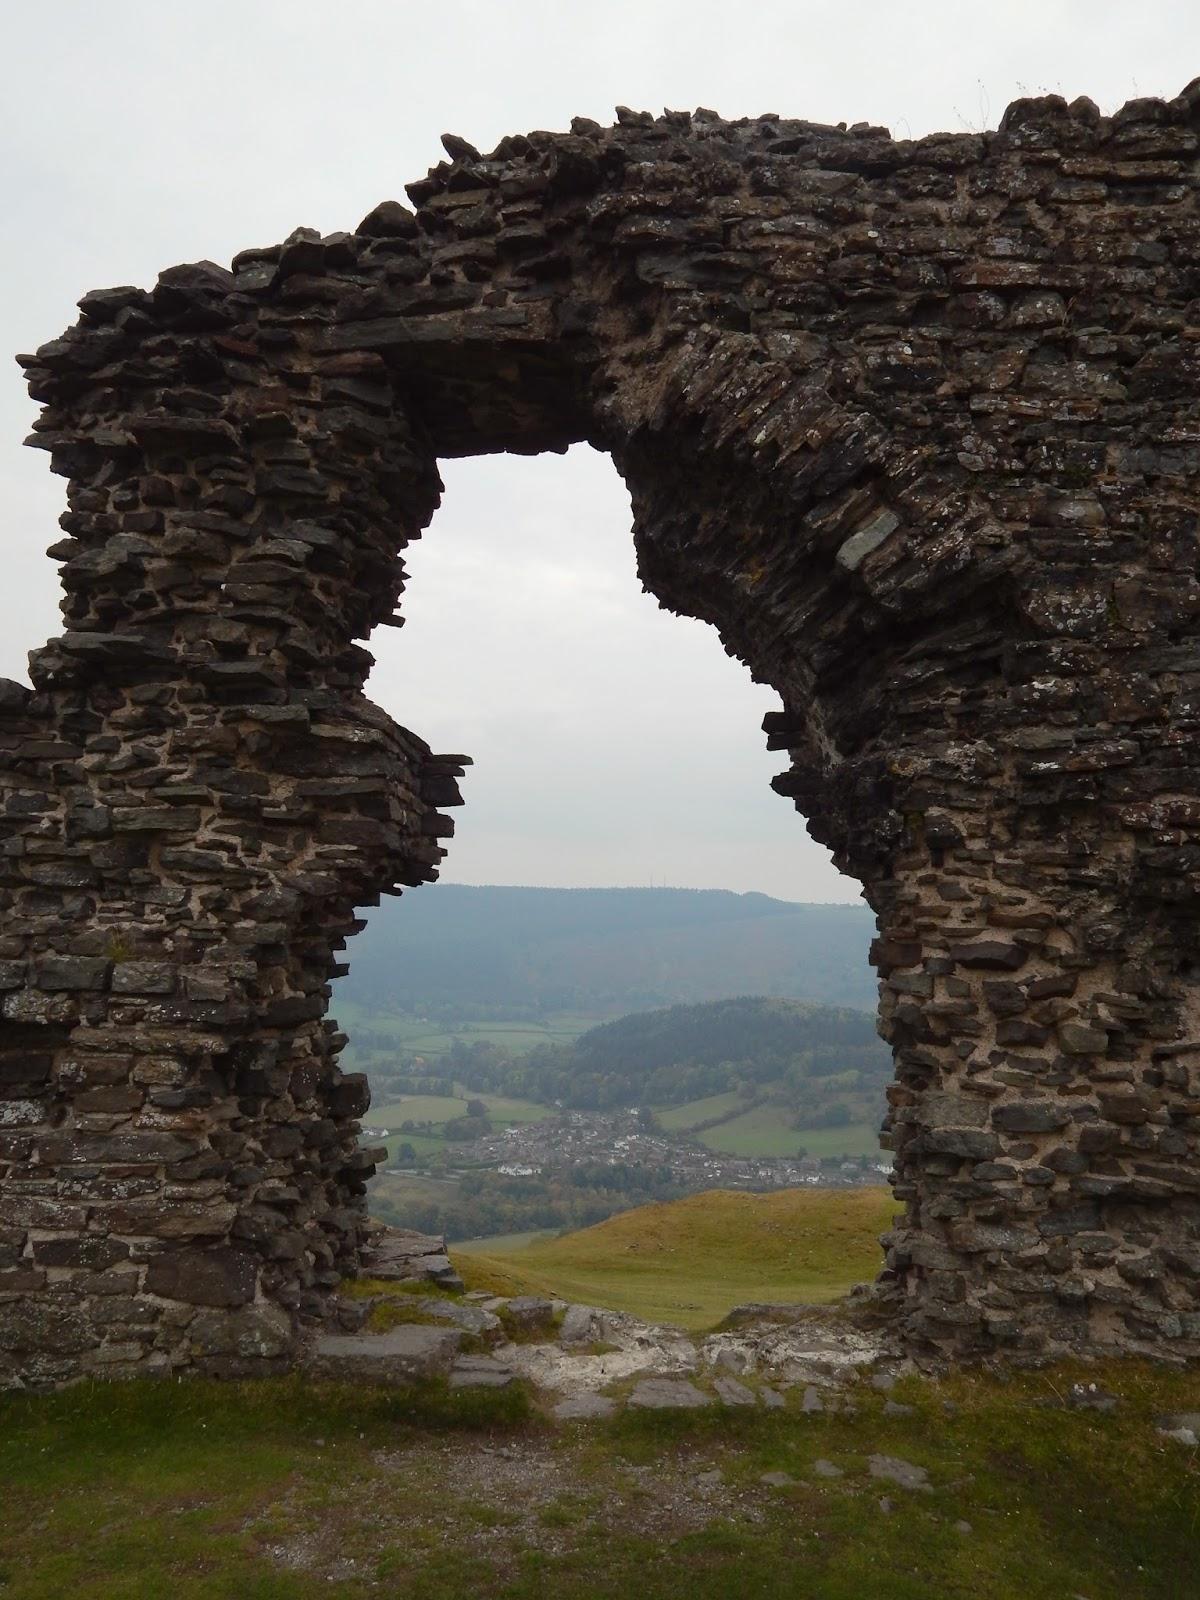 Dinas Bran North Wales in Autumn